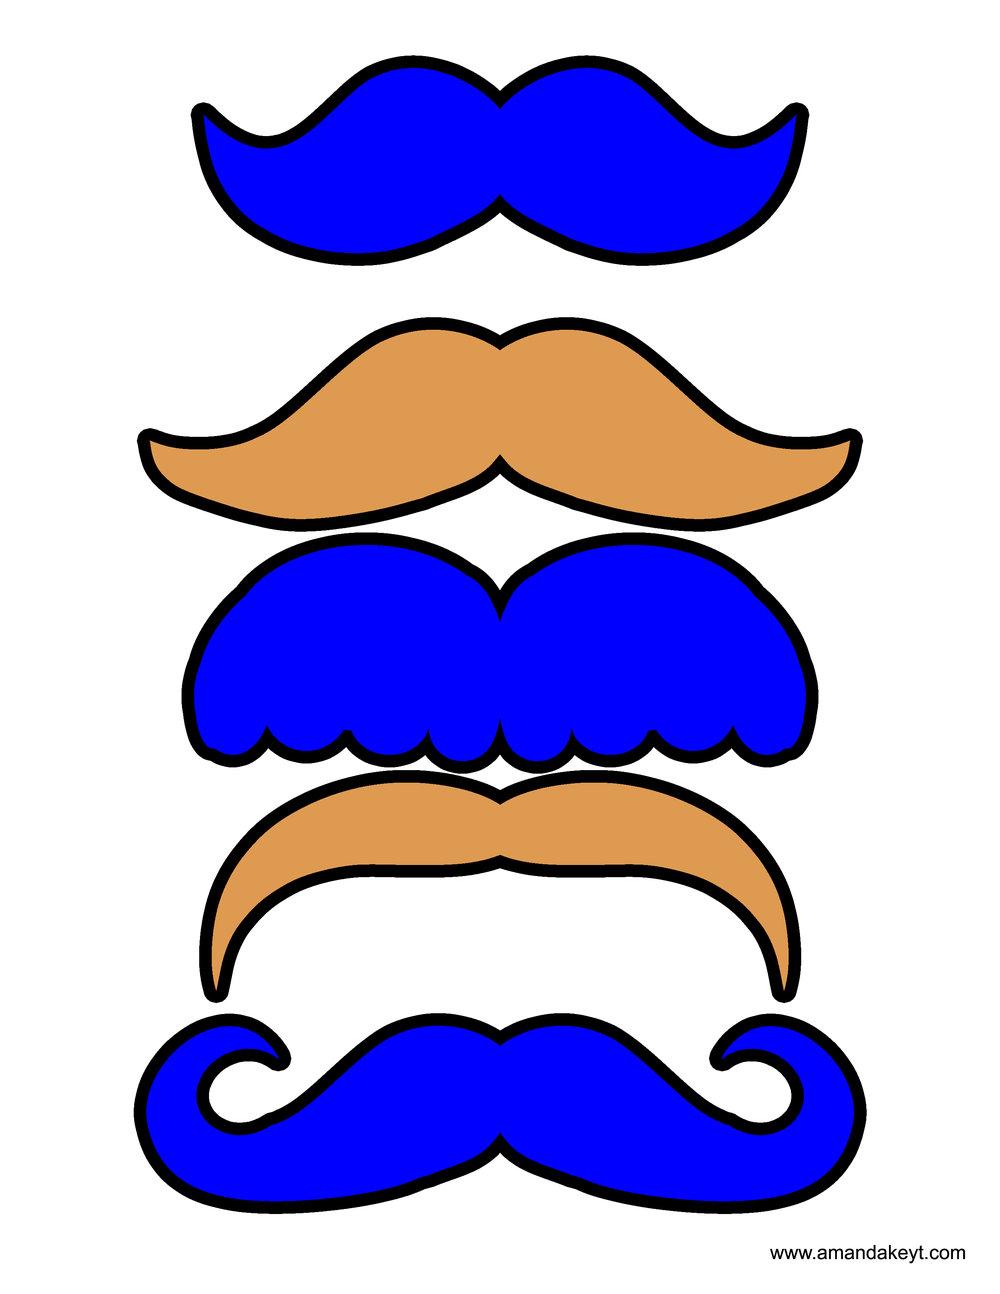 Mustaches2.jpg